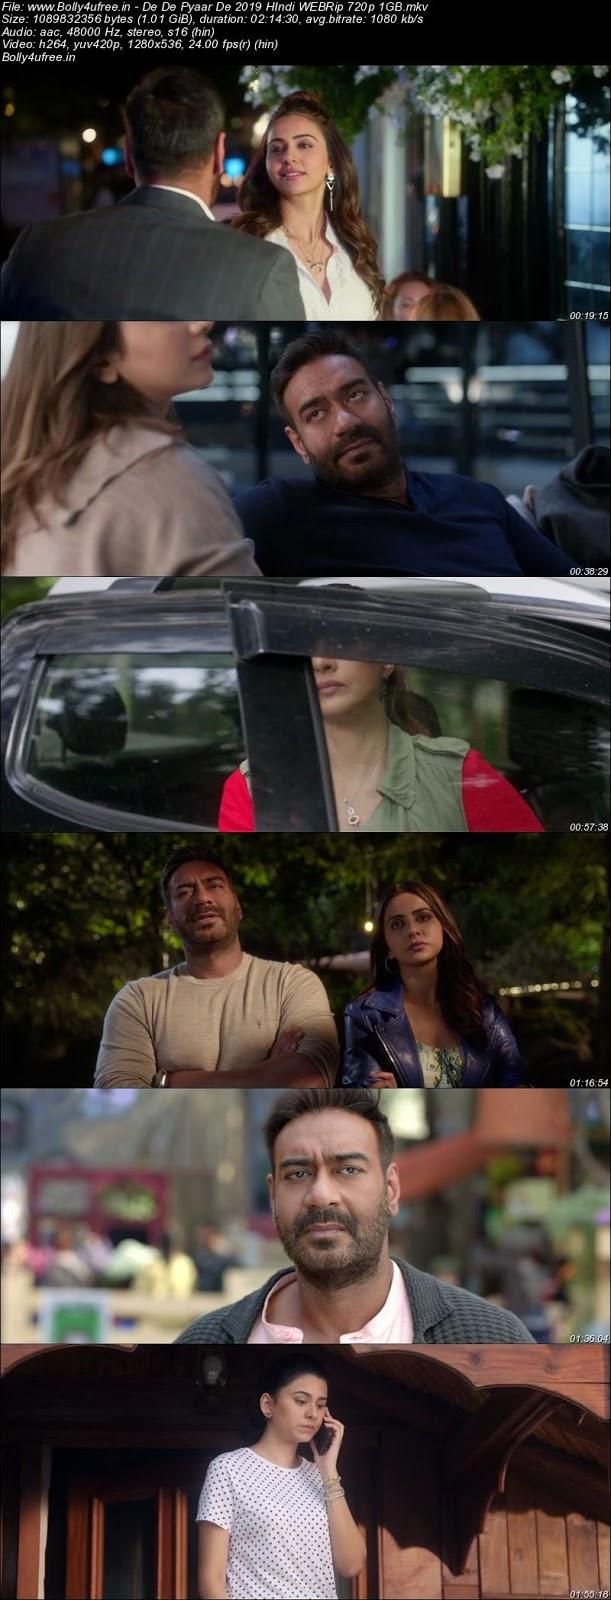 De De Pyaar De 2019 Hindi 300Mb 480p WEBRip Full Movie Download Bolly4ufree